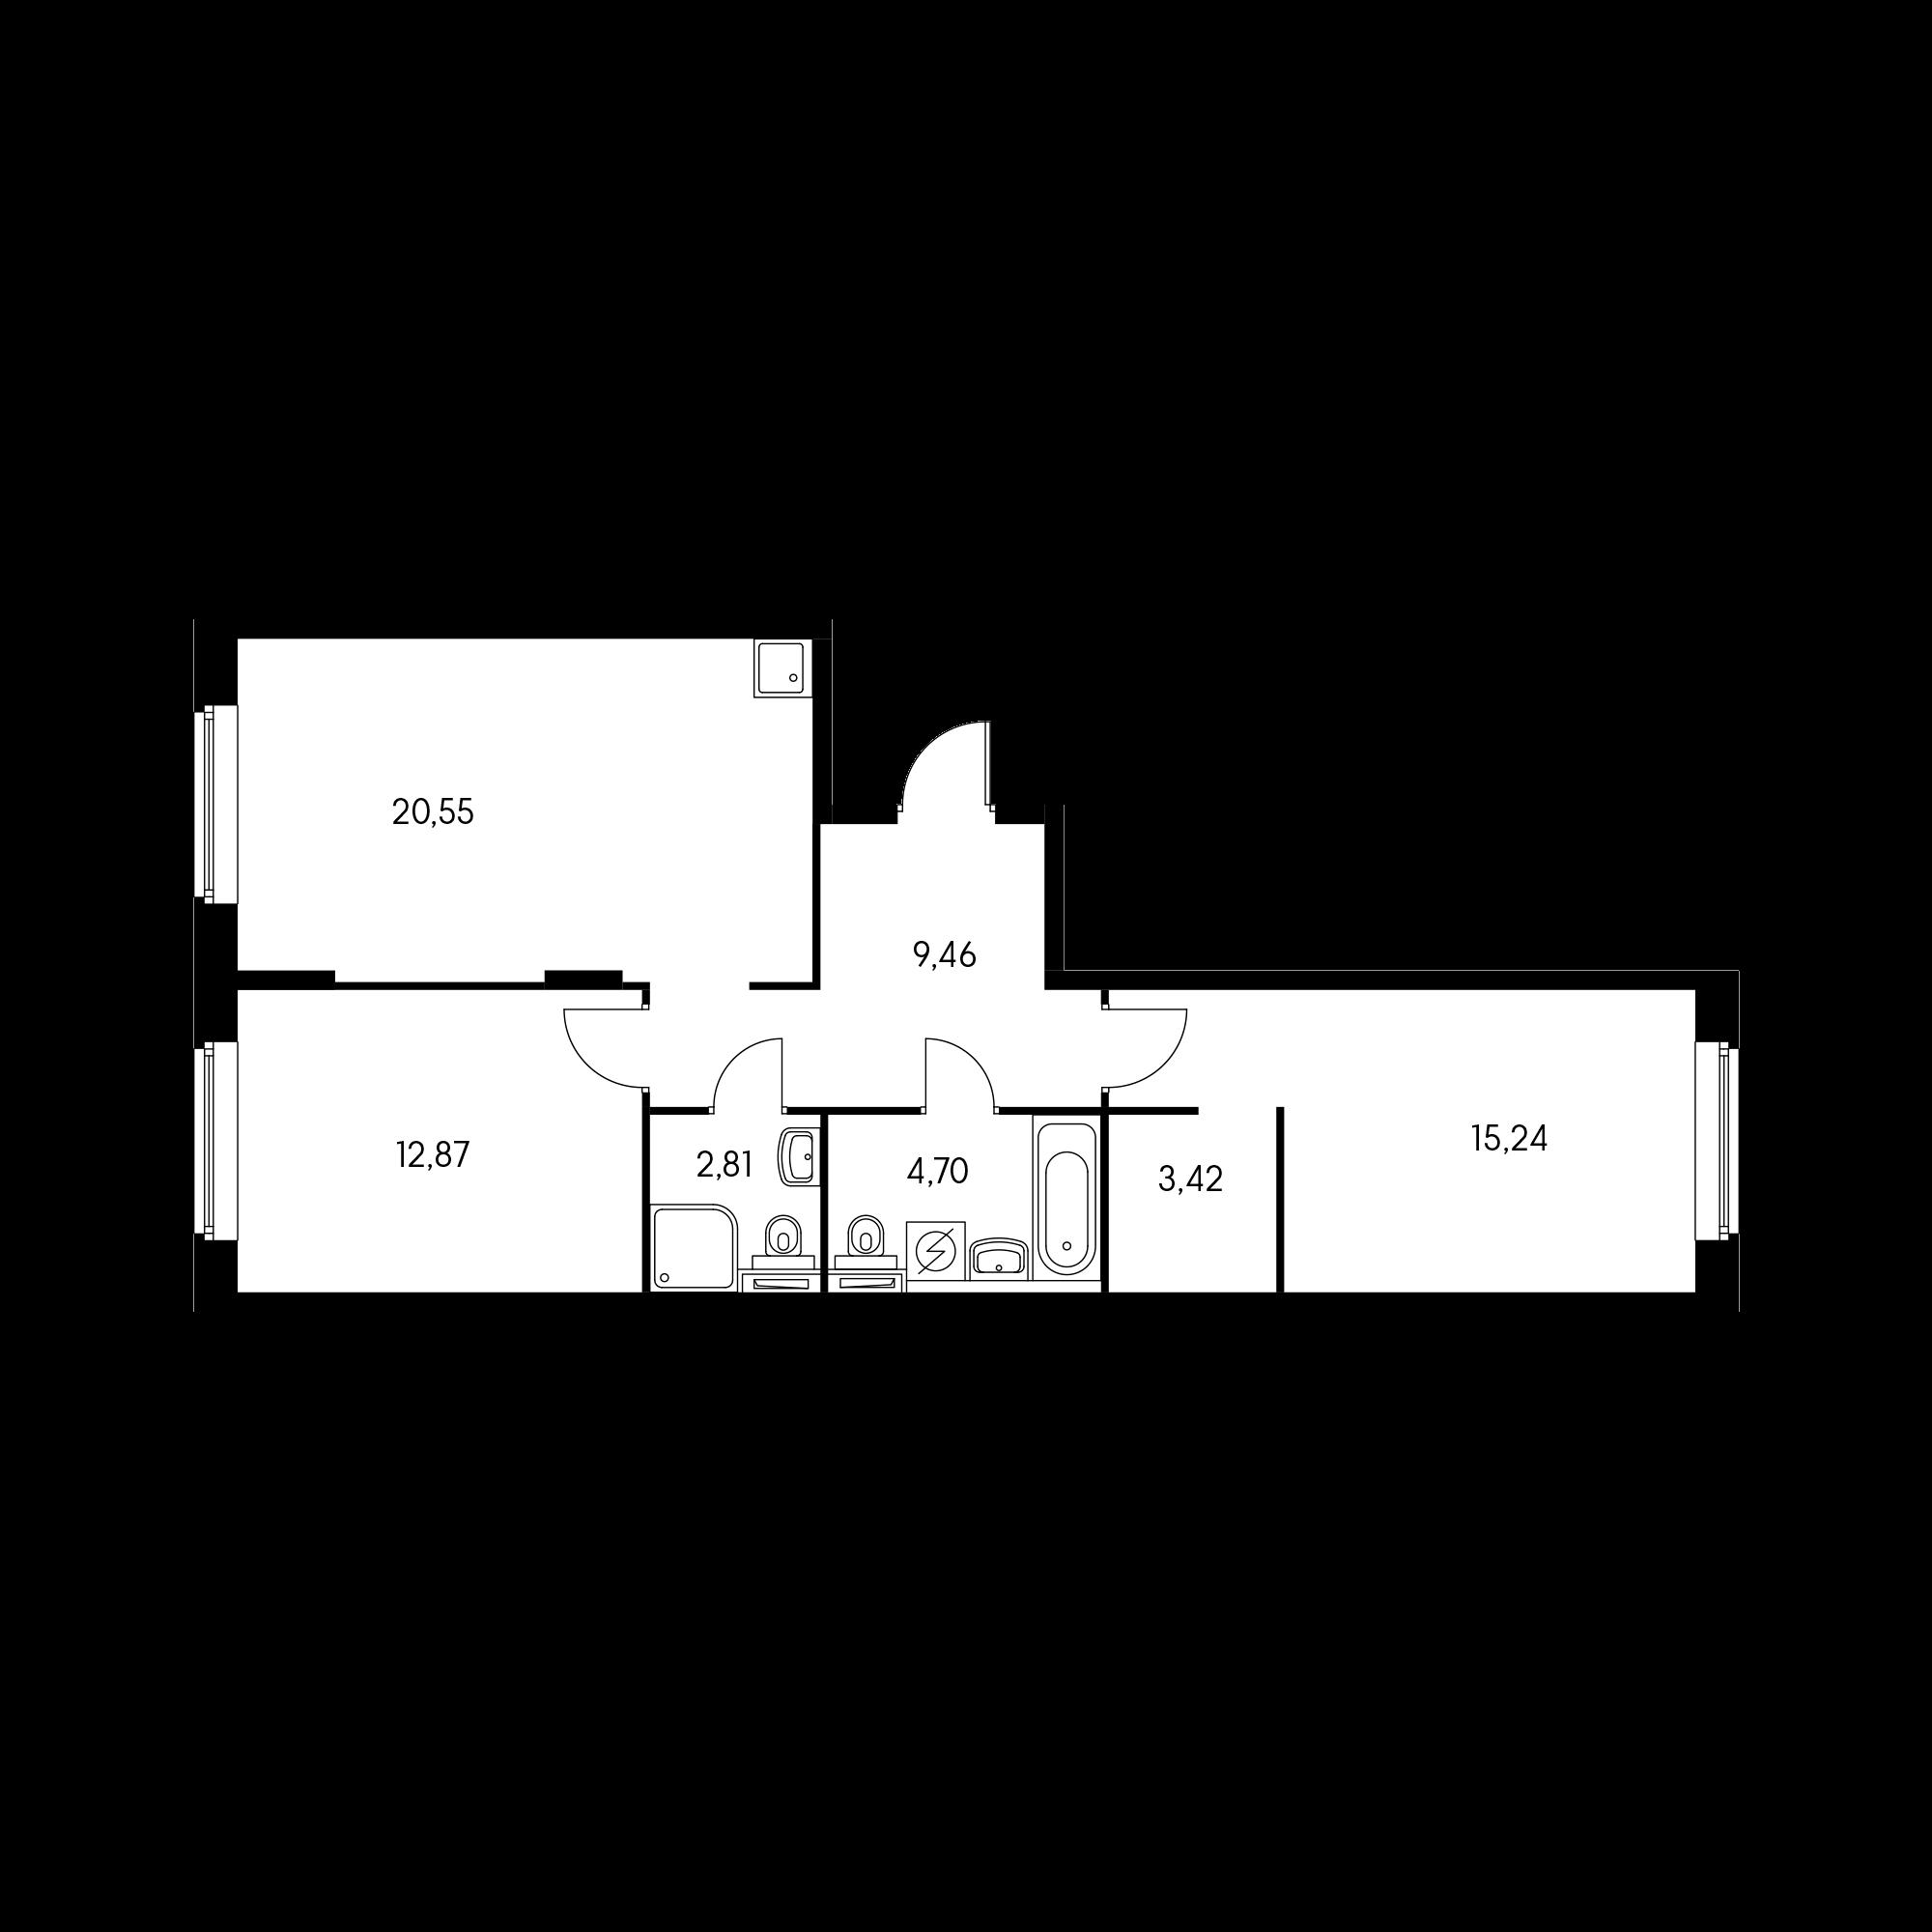 2EL3_6.9-1*